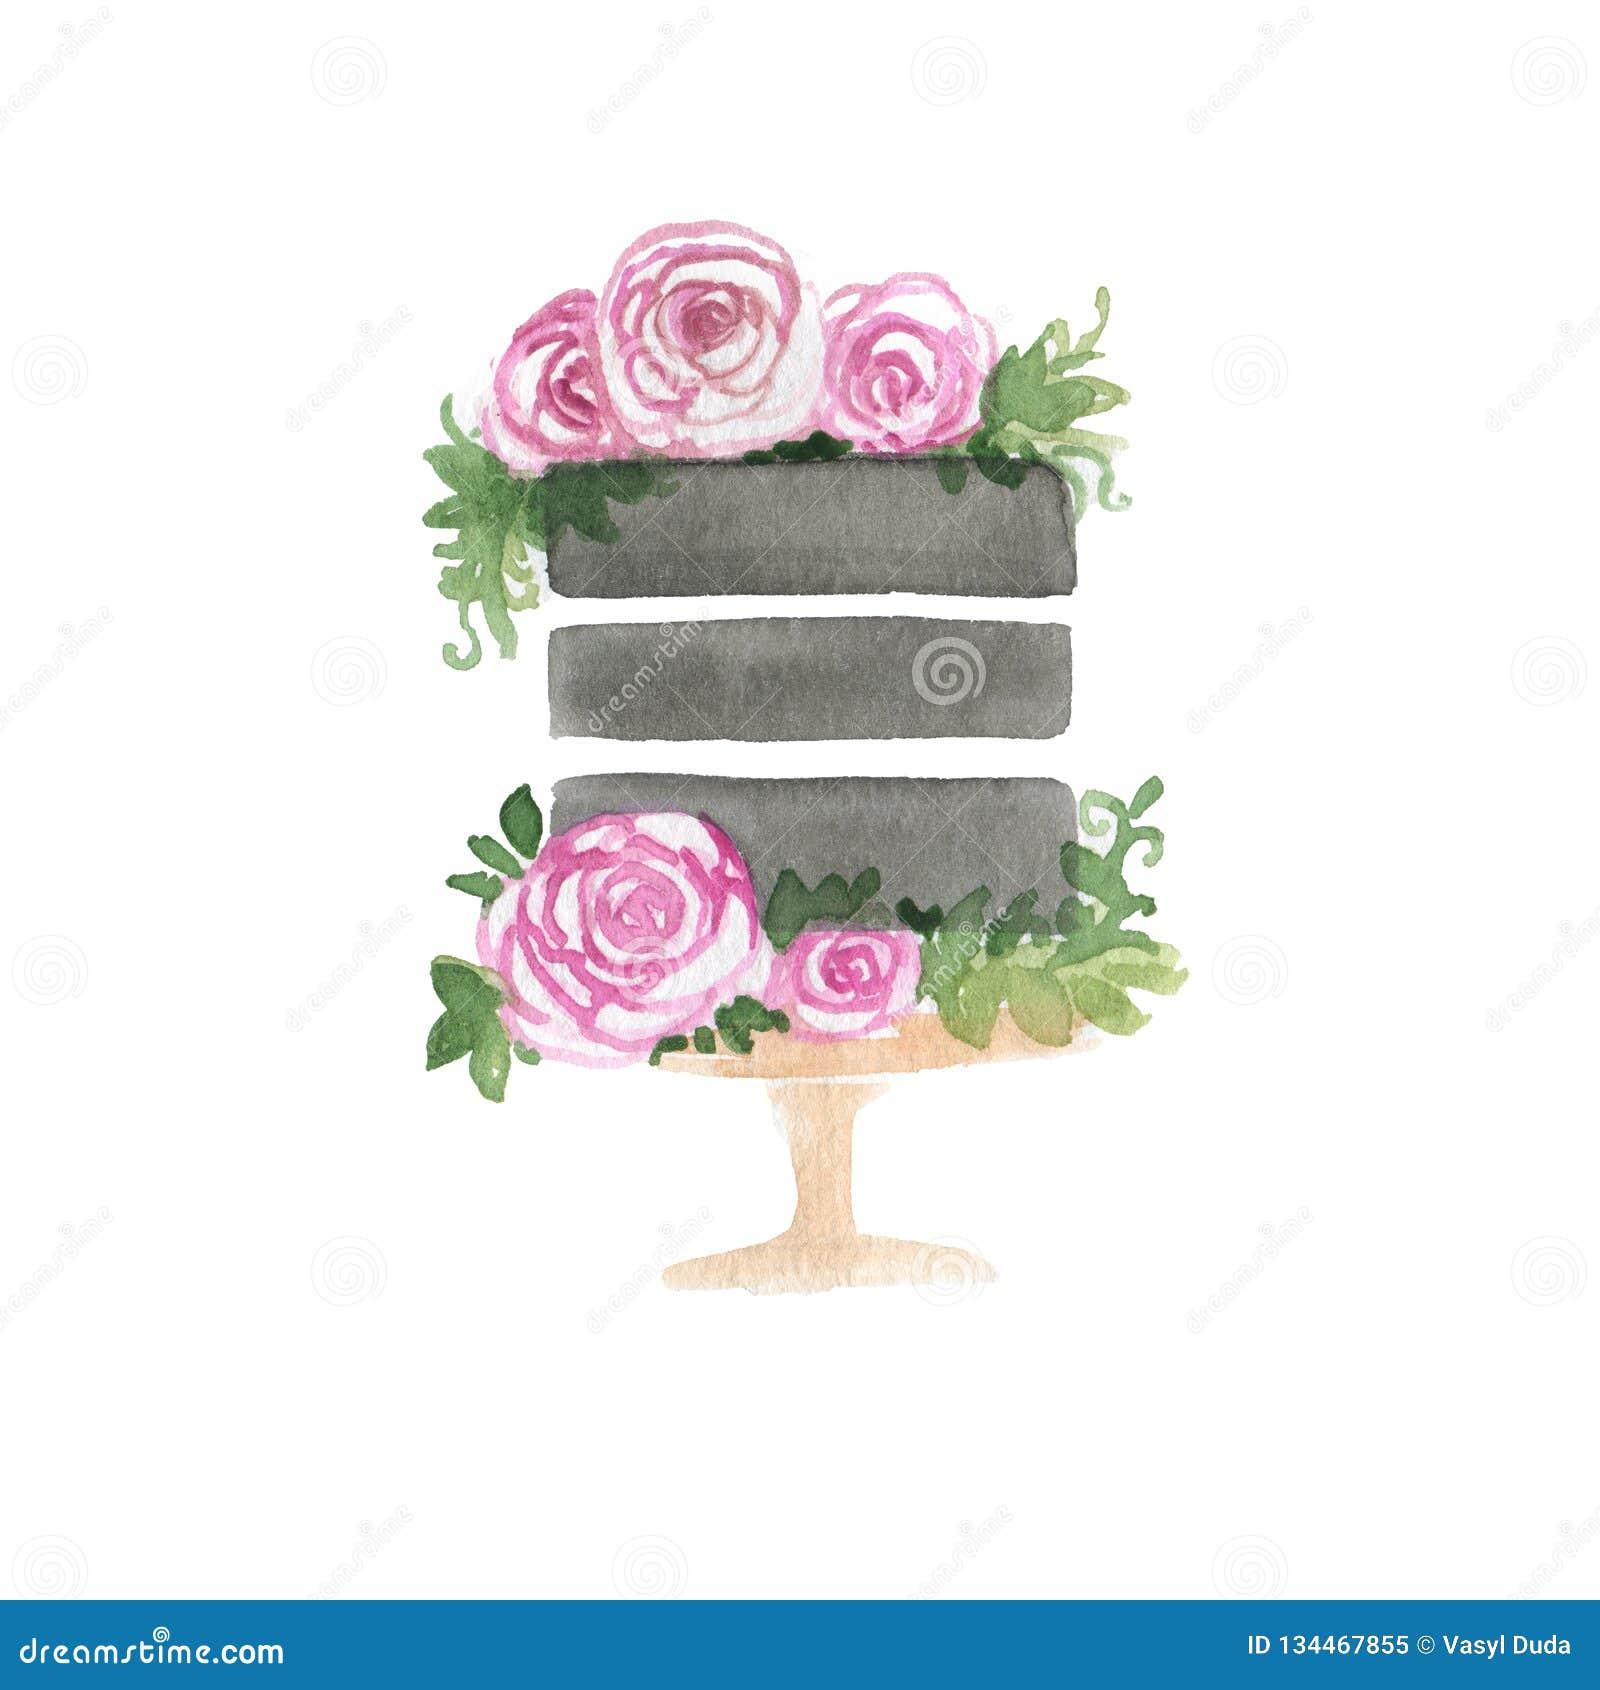 Food Clipart stock illustration. Illustration of floral ...